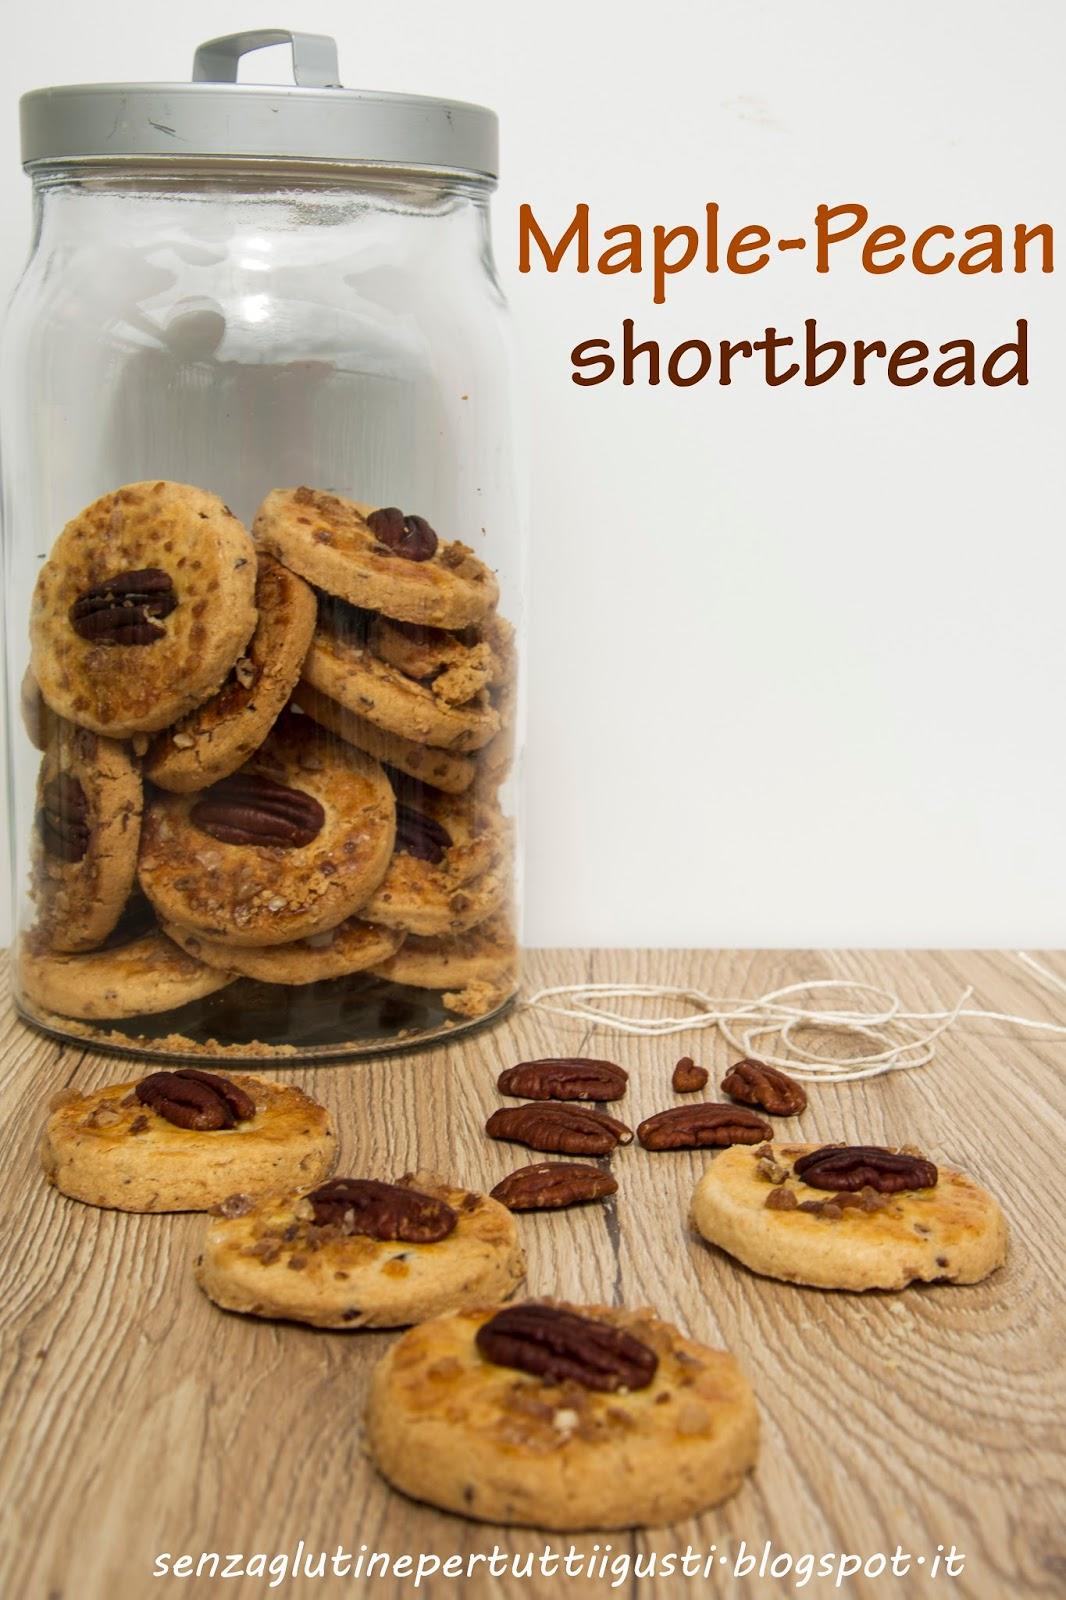 Maple-pecan shortbread di Martha Stewart senza glutine   Ricetta ed ...